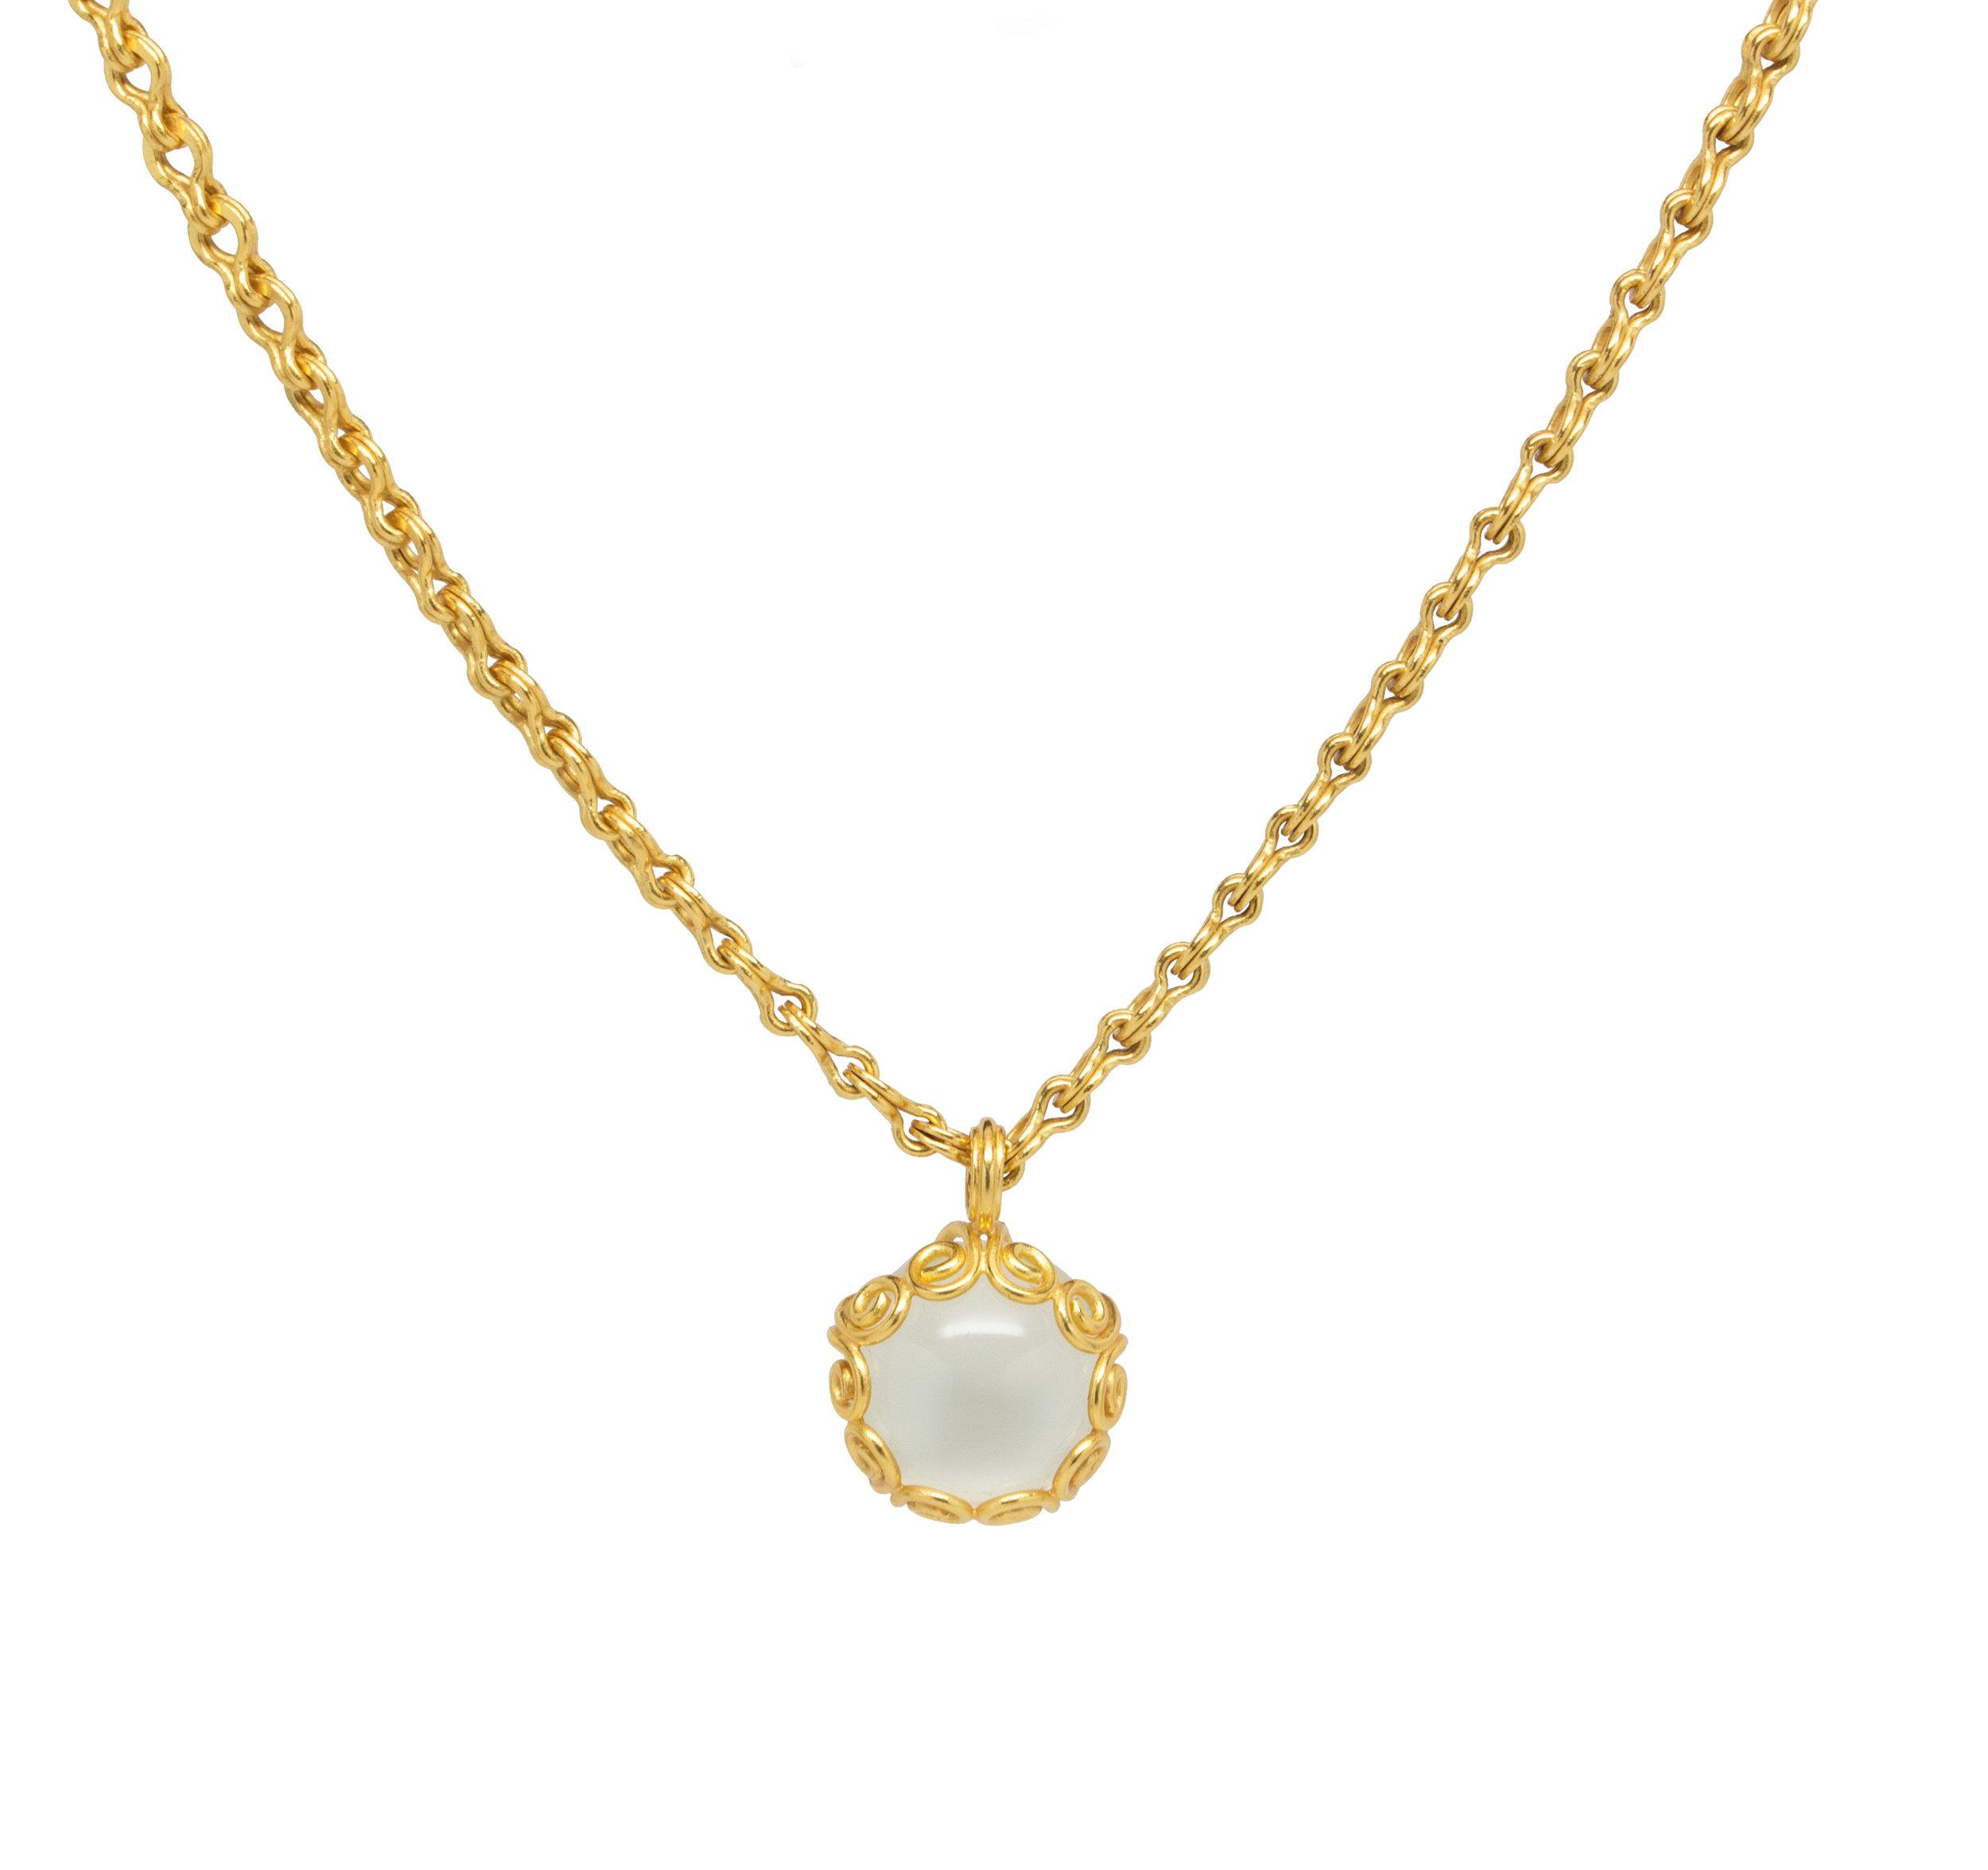 dec20 jewelry4-459.jpg